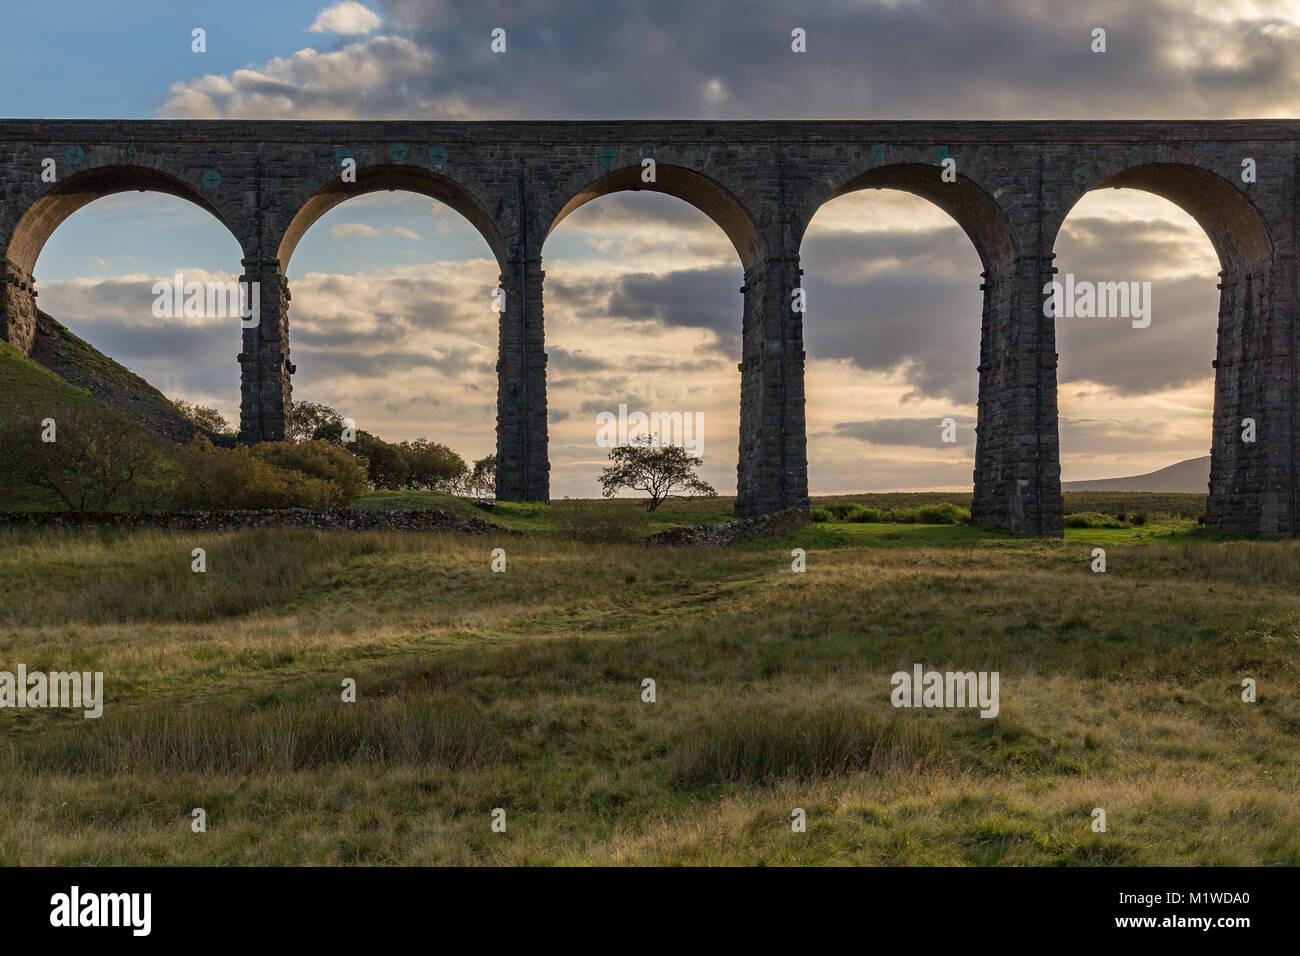 La Ribblehead viaducto sobre el ferrocarril Settle-Carlisle, cerca Ingleton en Yorkshire Dales, North Yorkshire, Imagen De Stock